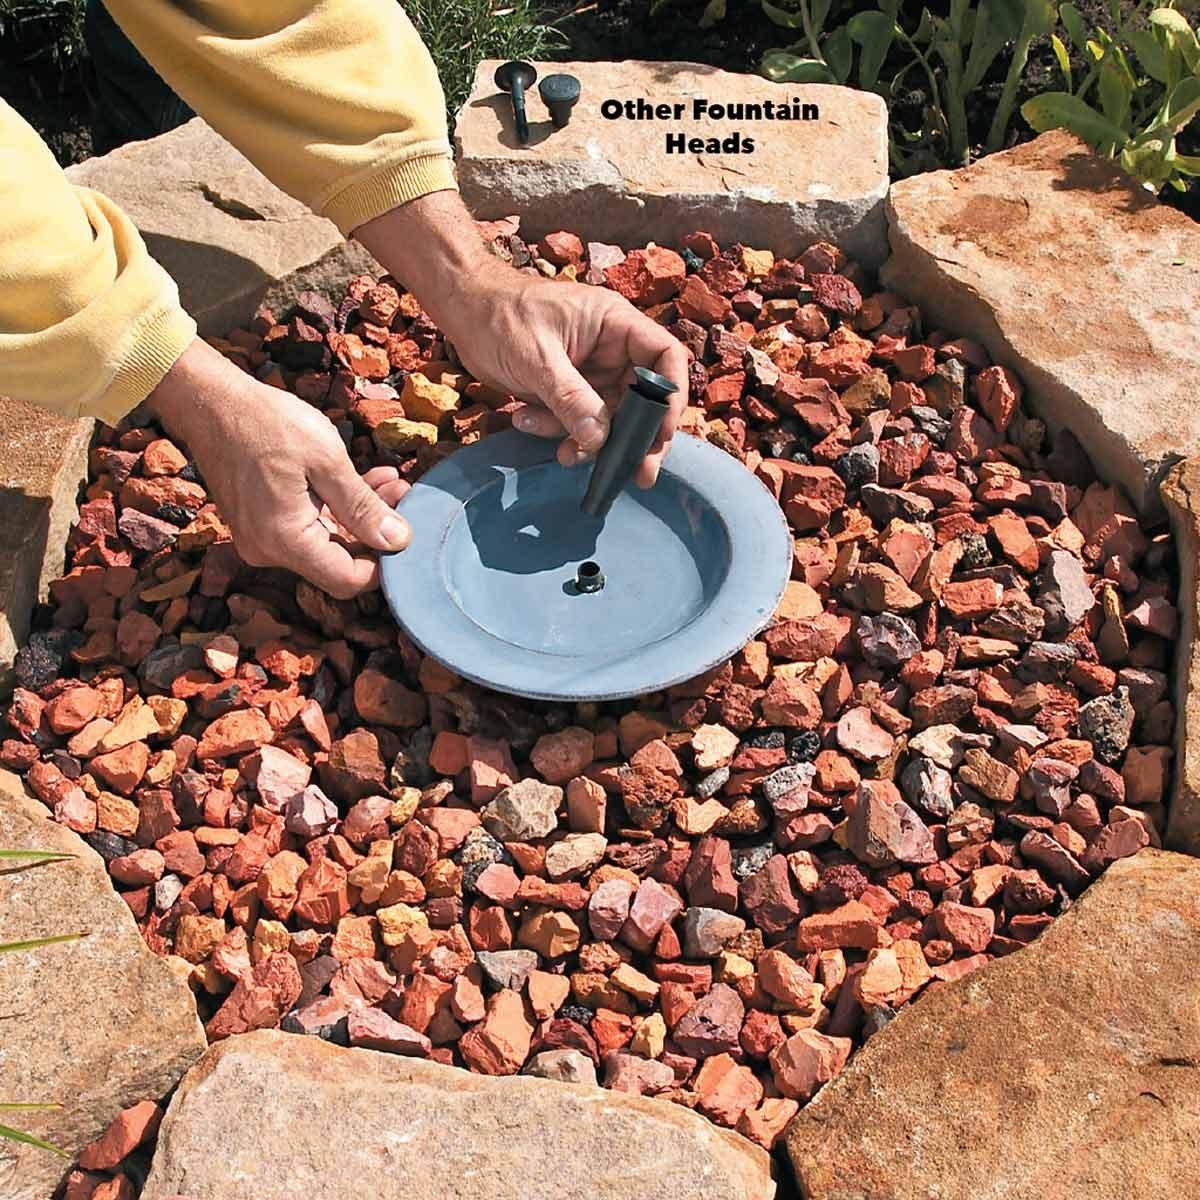 Soothing Fountain add fountain head